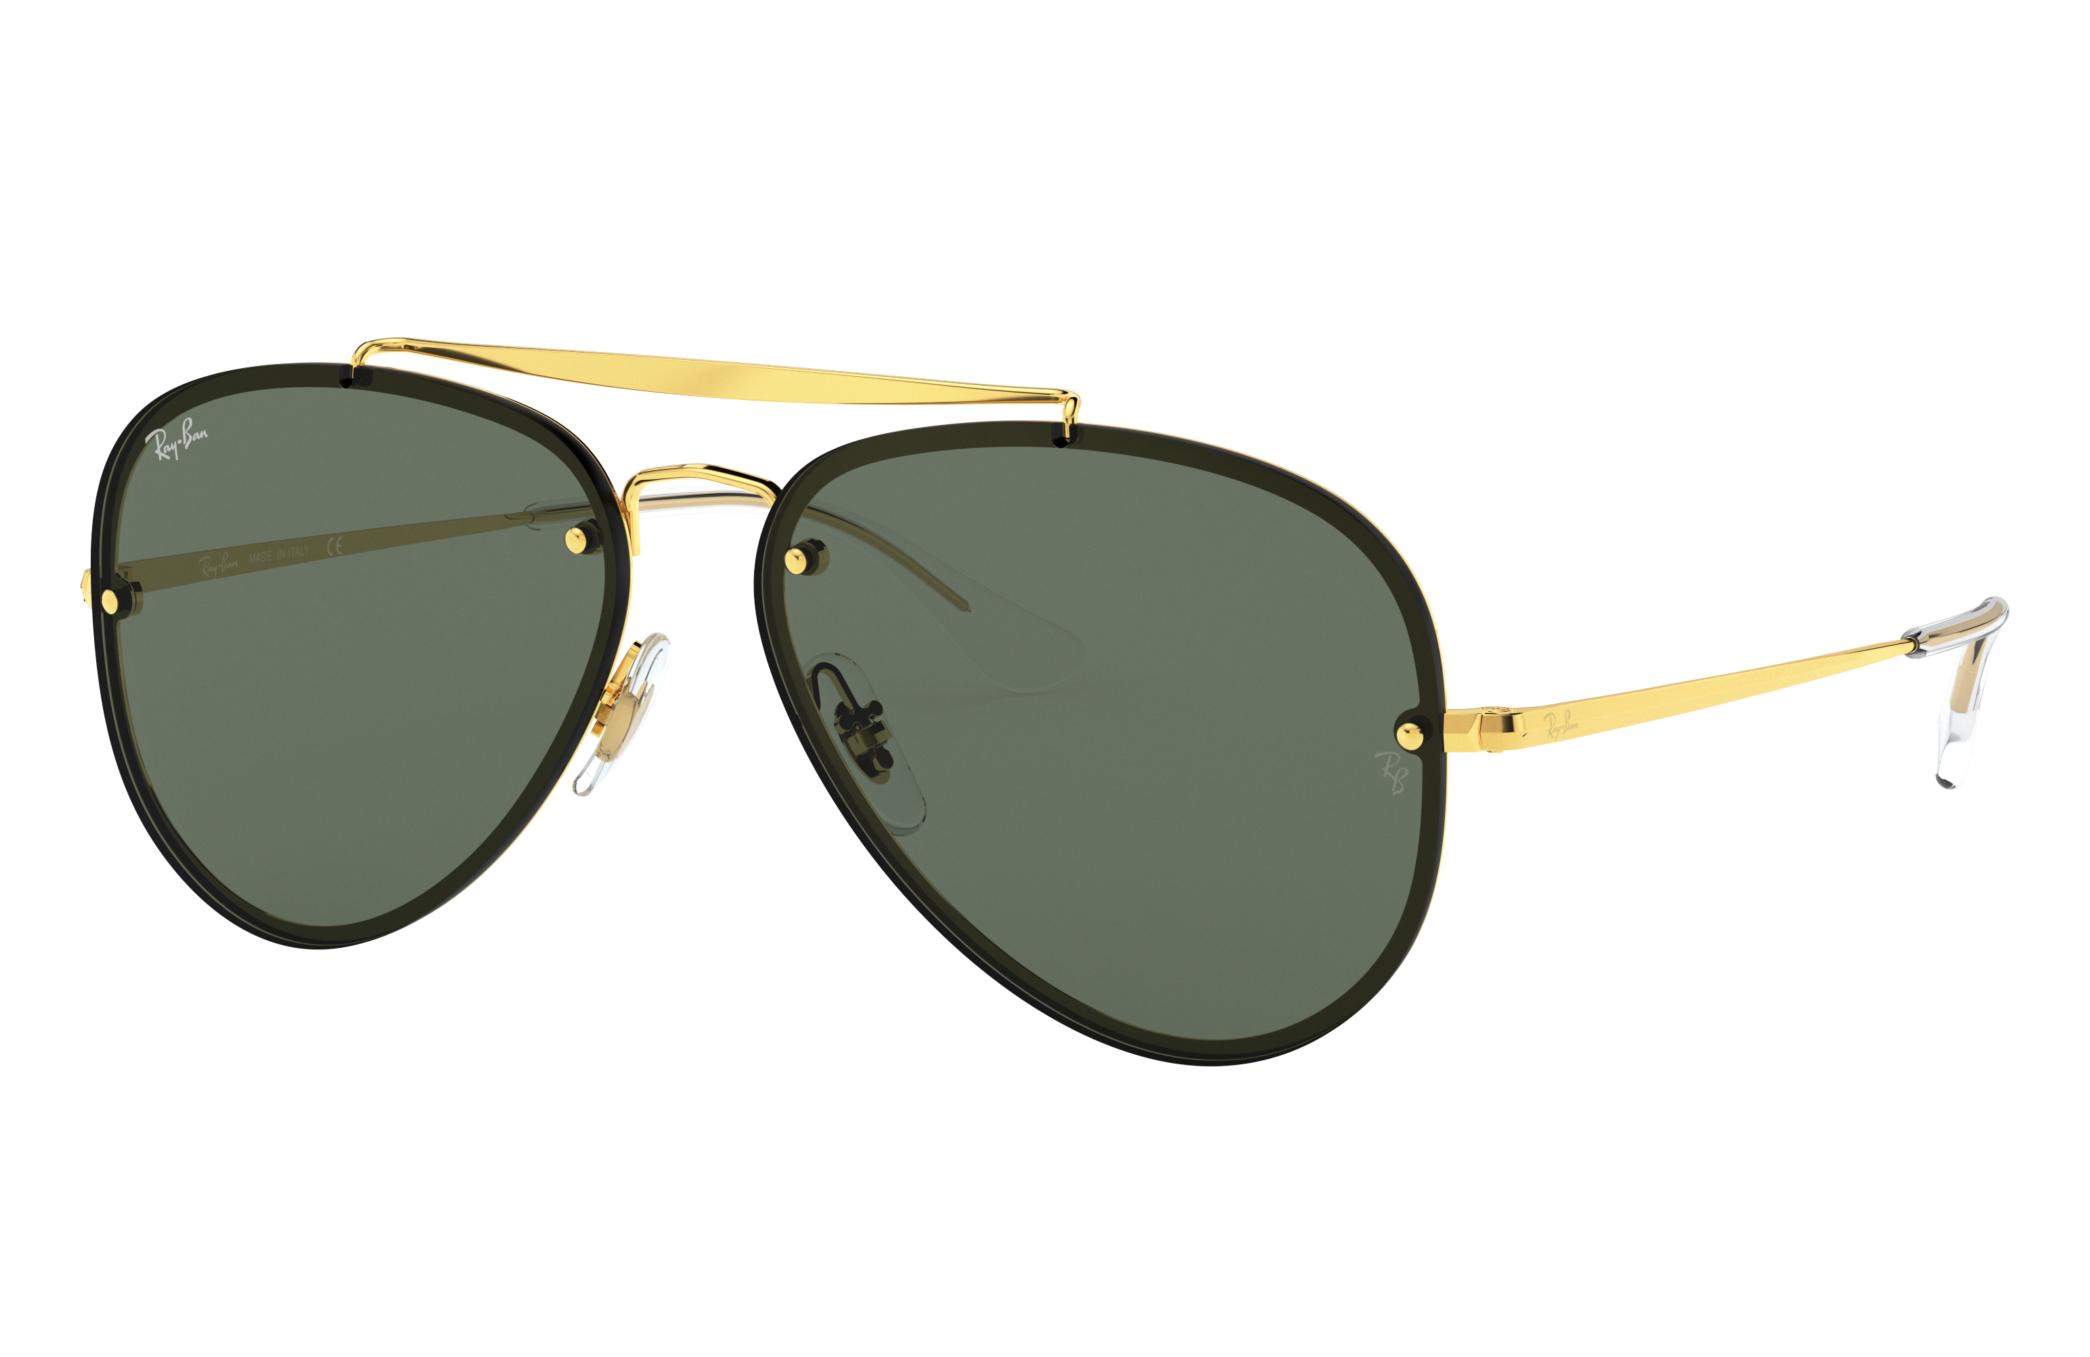 Ray-Ban Blaze Aviator Gold, Green Lenses - RB3584N